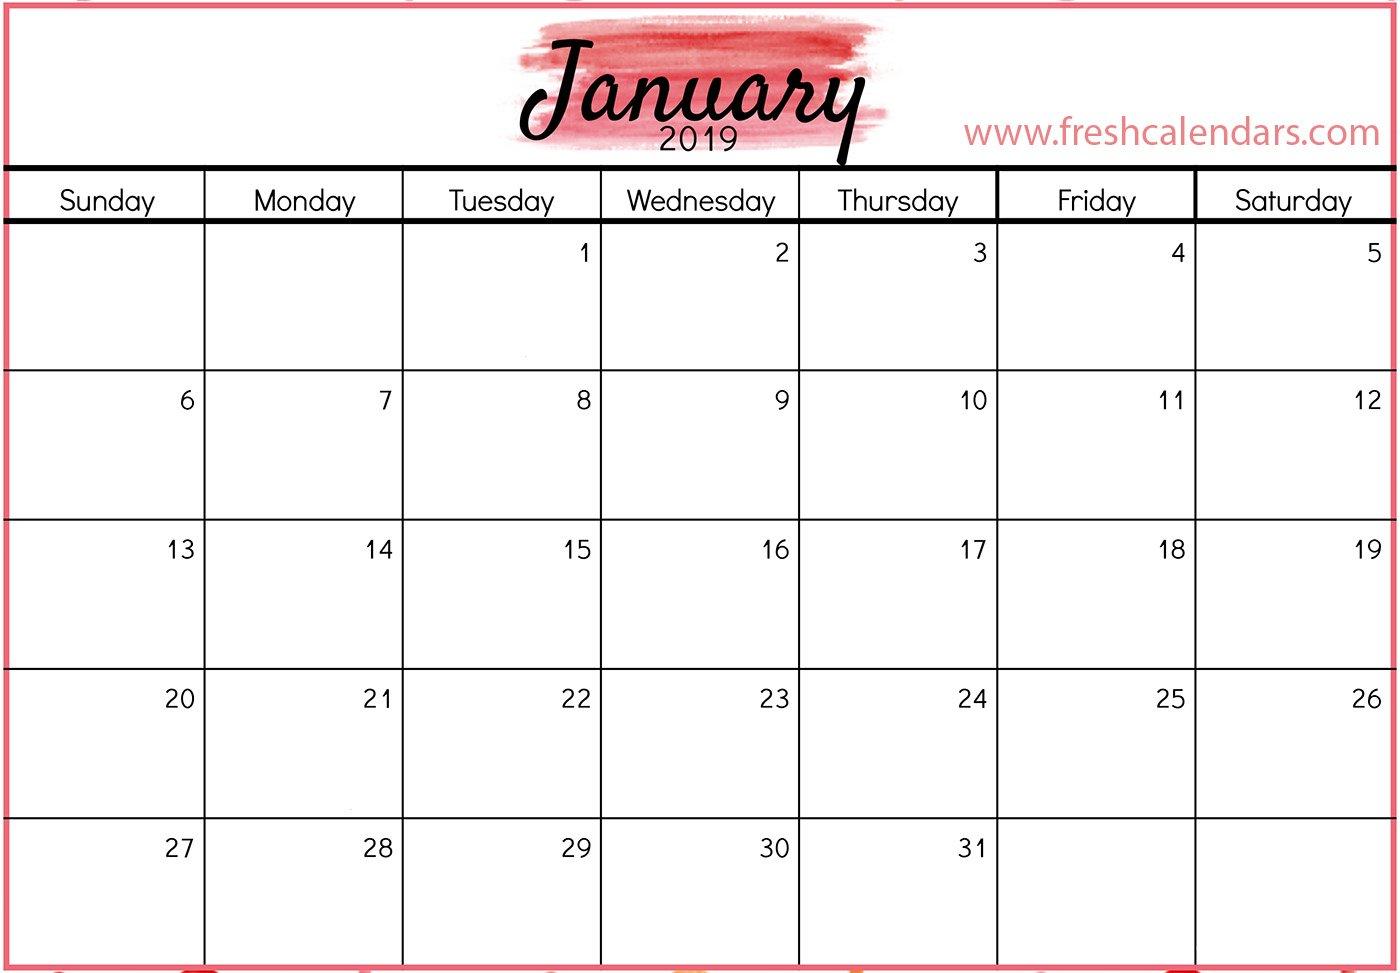 January 2019 Calendar Printable – Fresh Calendars Calendar 2019 Printable January